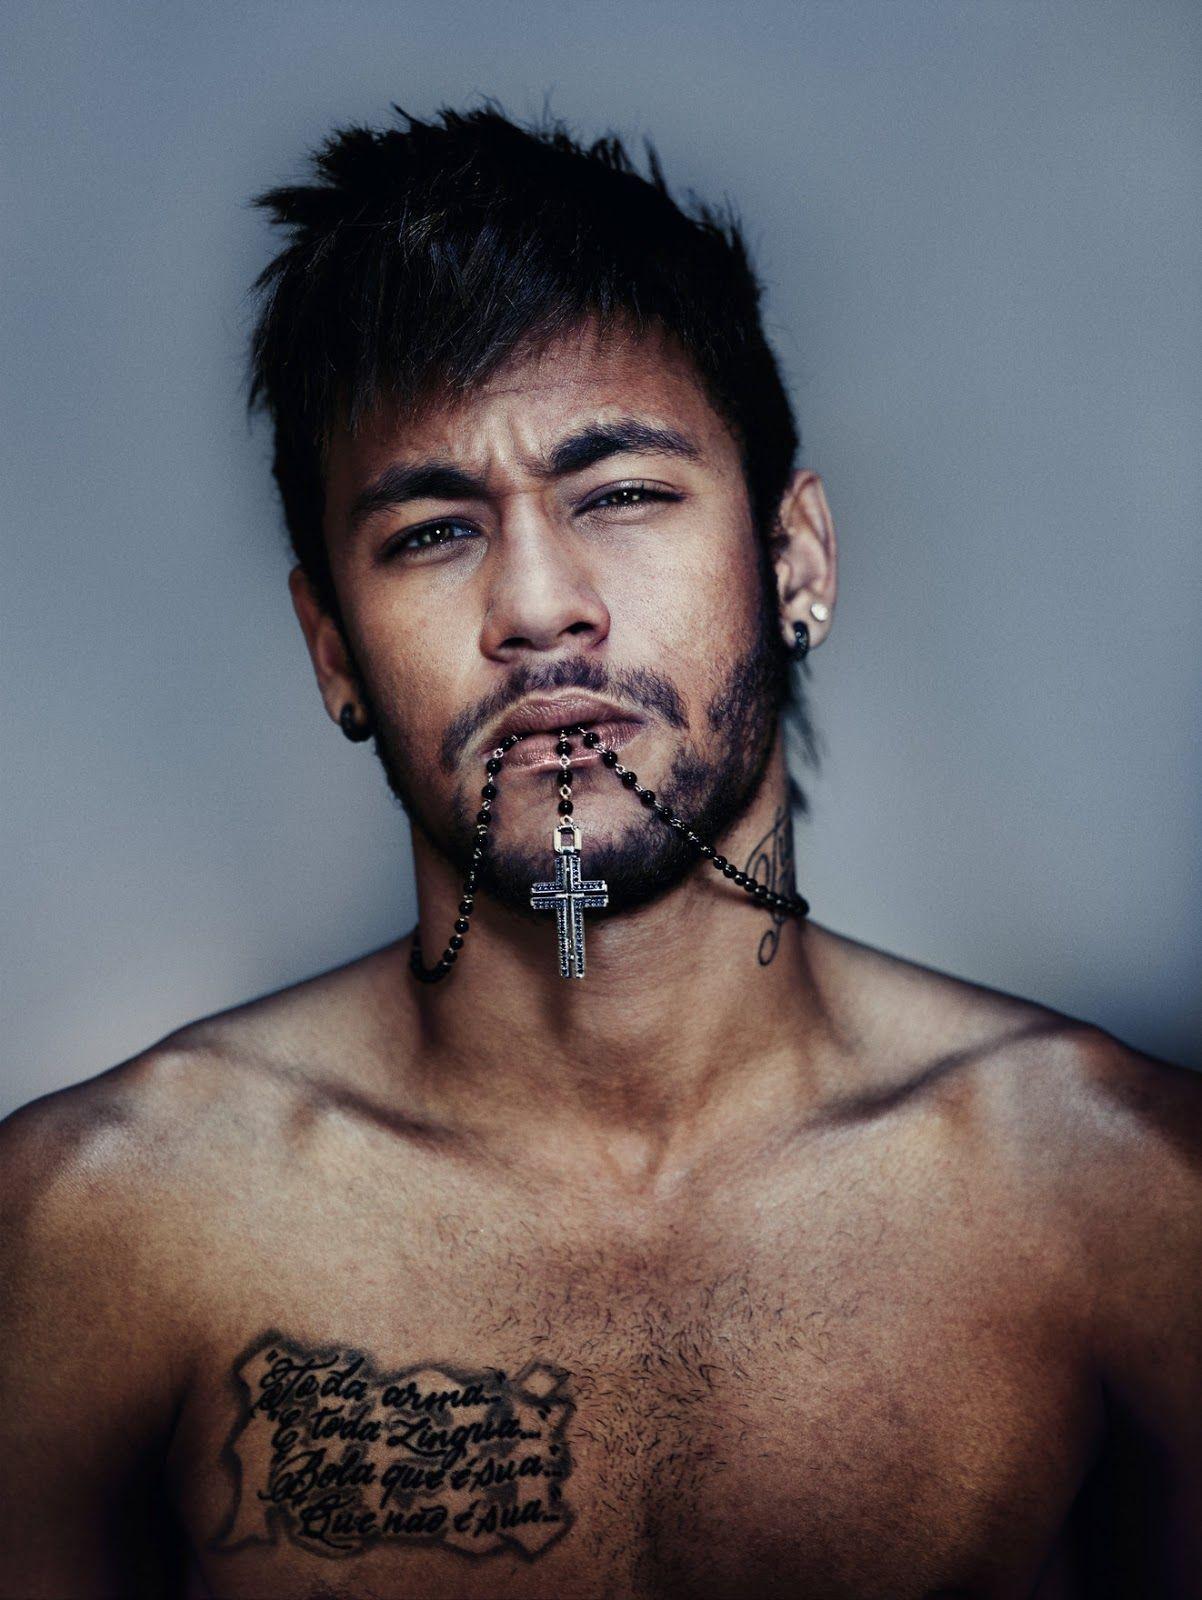 Neymar Hairstyle cool neymar jrs blonde locks Neymar Hairstyle With Regard To Be Smart Cutting Hair According To Neymar Hairstyle With Regard